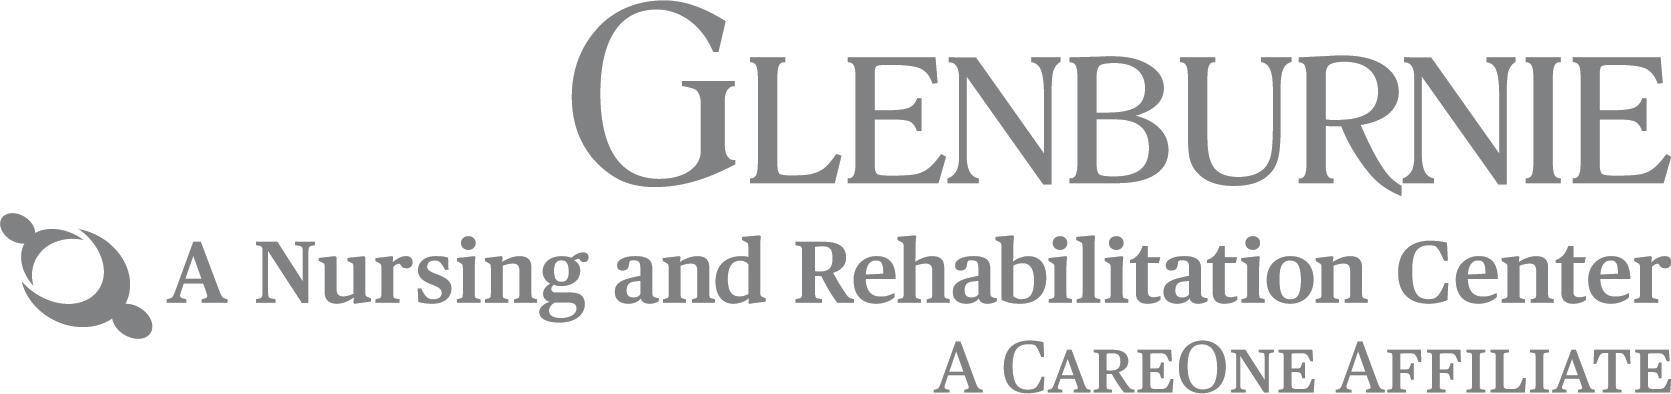 Glenburnie Rehabilitation and Nursing Center image 0